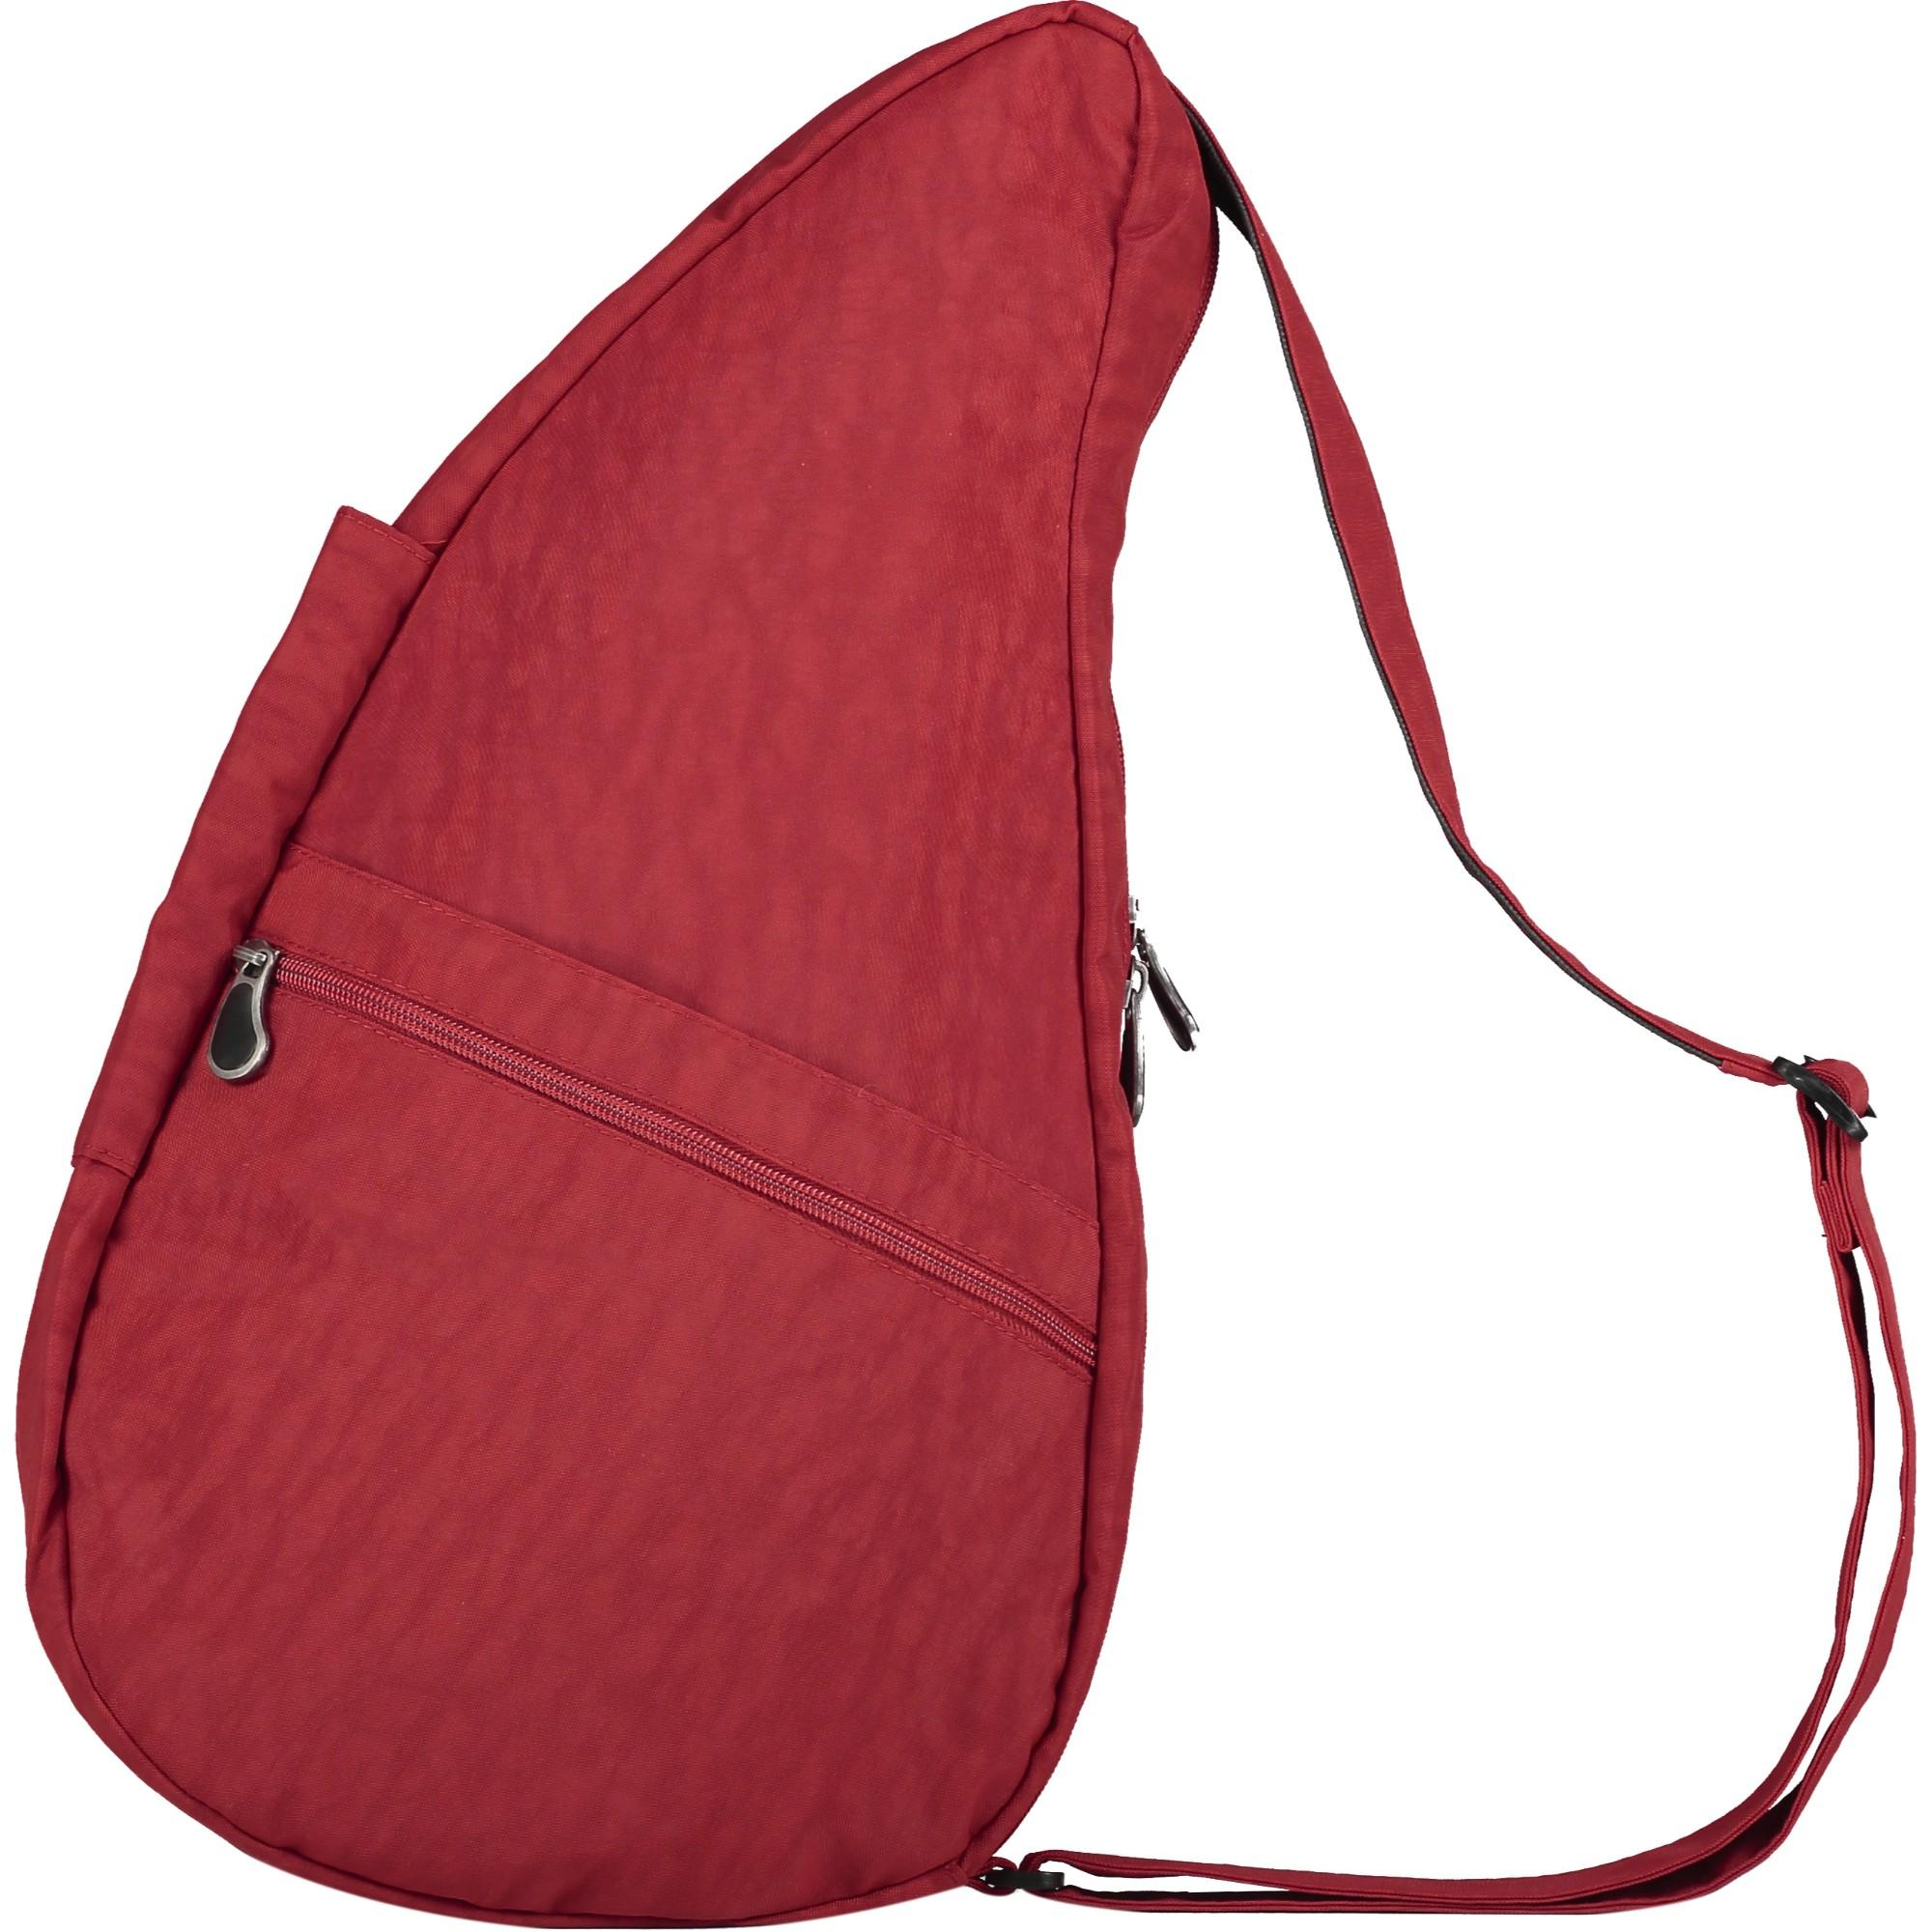 Healthy Backbag Textured Nylon - Crimson